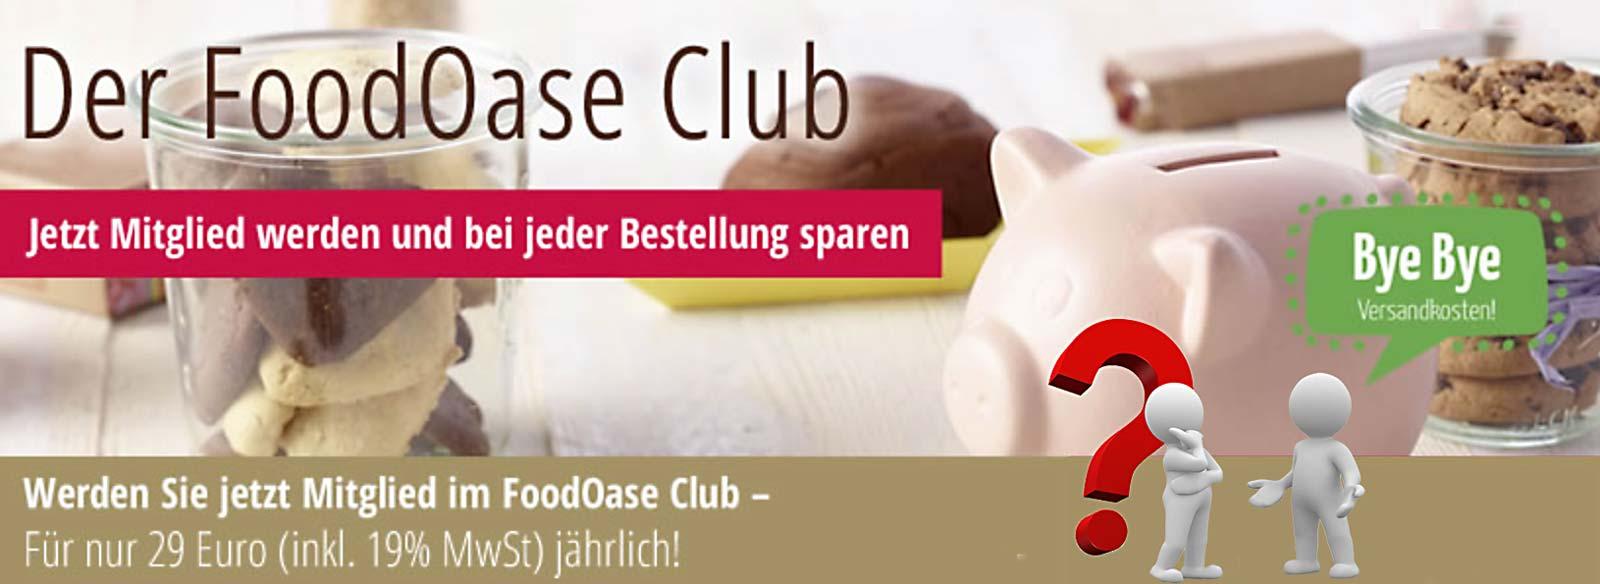 Banner_FoodOase_Club